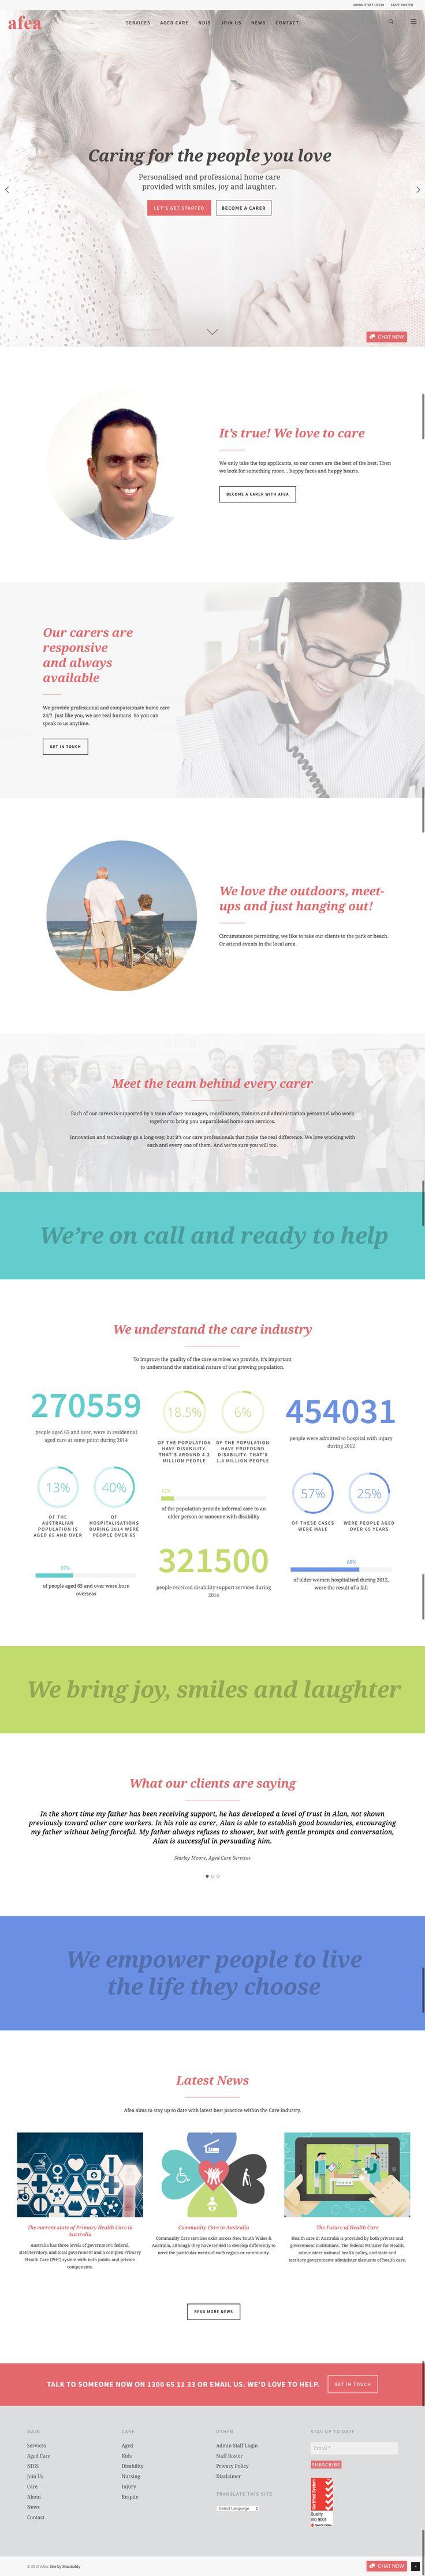 New responsive responsive website by KORE (http://kore.digital/). Home page. #responsivedesign #webdesign #wordpress